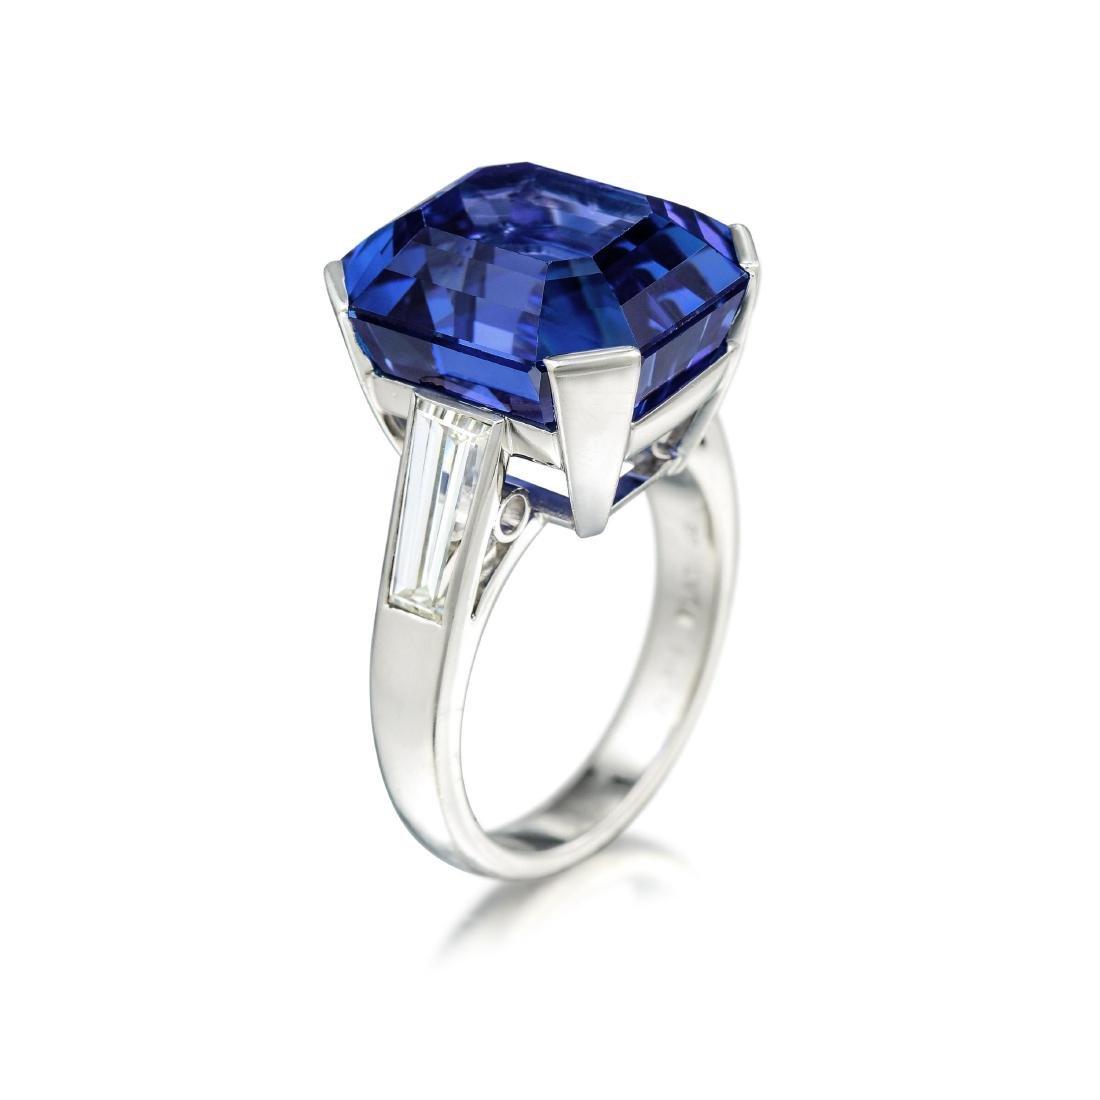 Art Deco 21.61-Carat Unheated Ceylon Sapphire and - 3